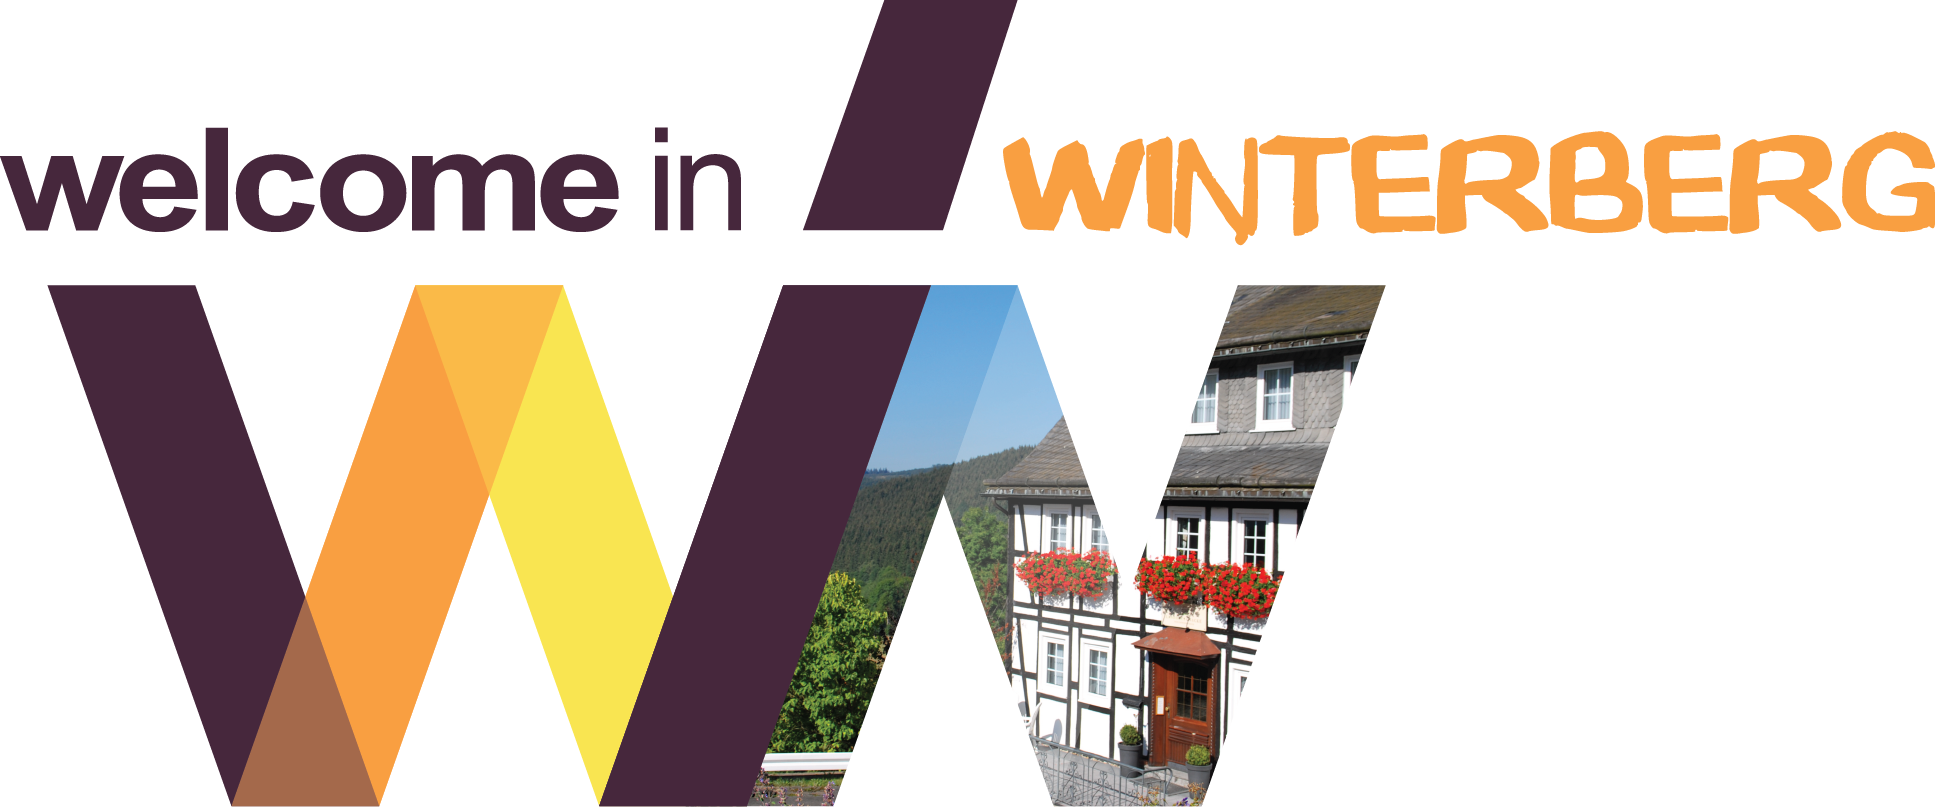 Welcome in Winterberg